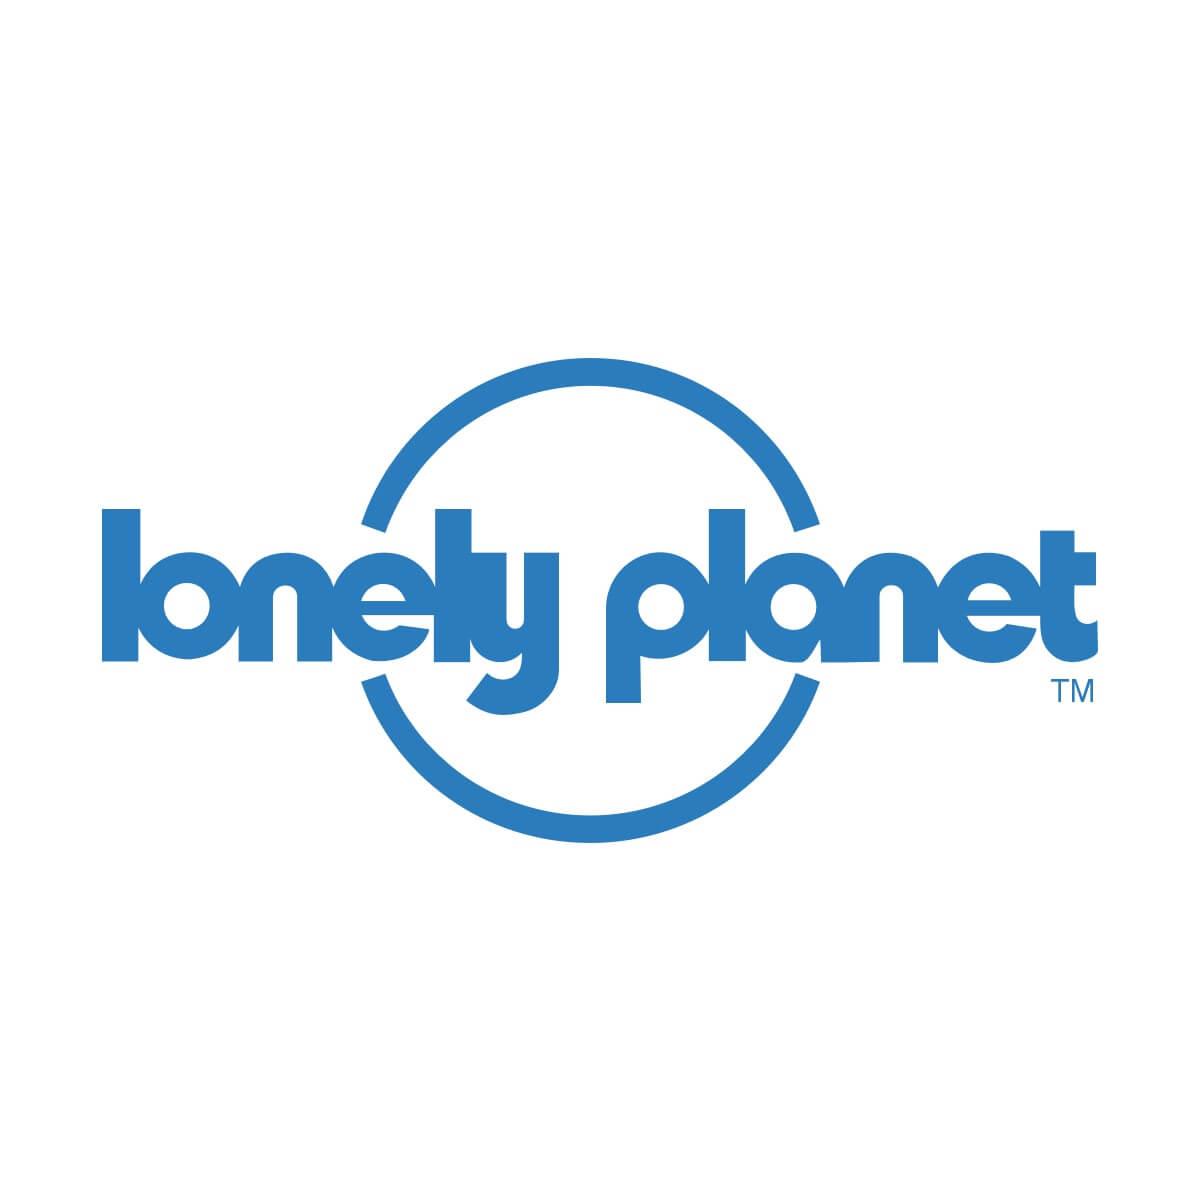 1+1 gratis @ Lonely Planet